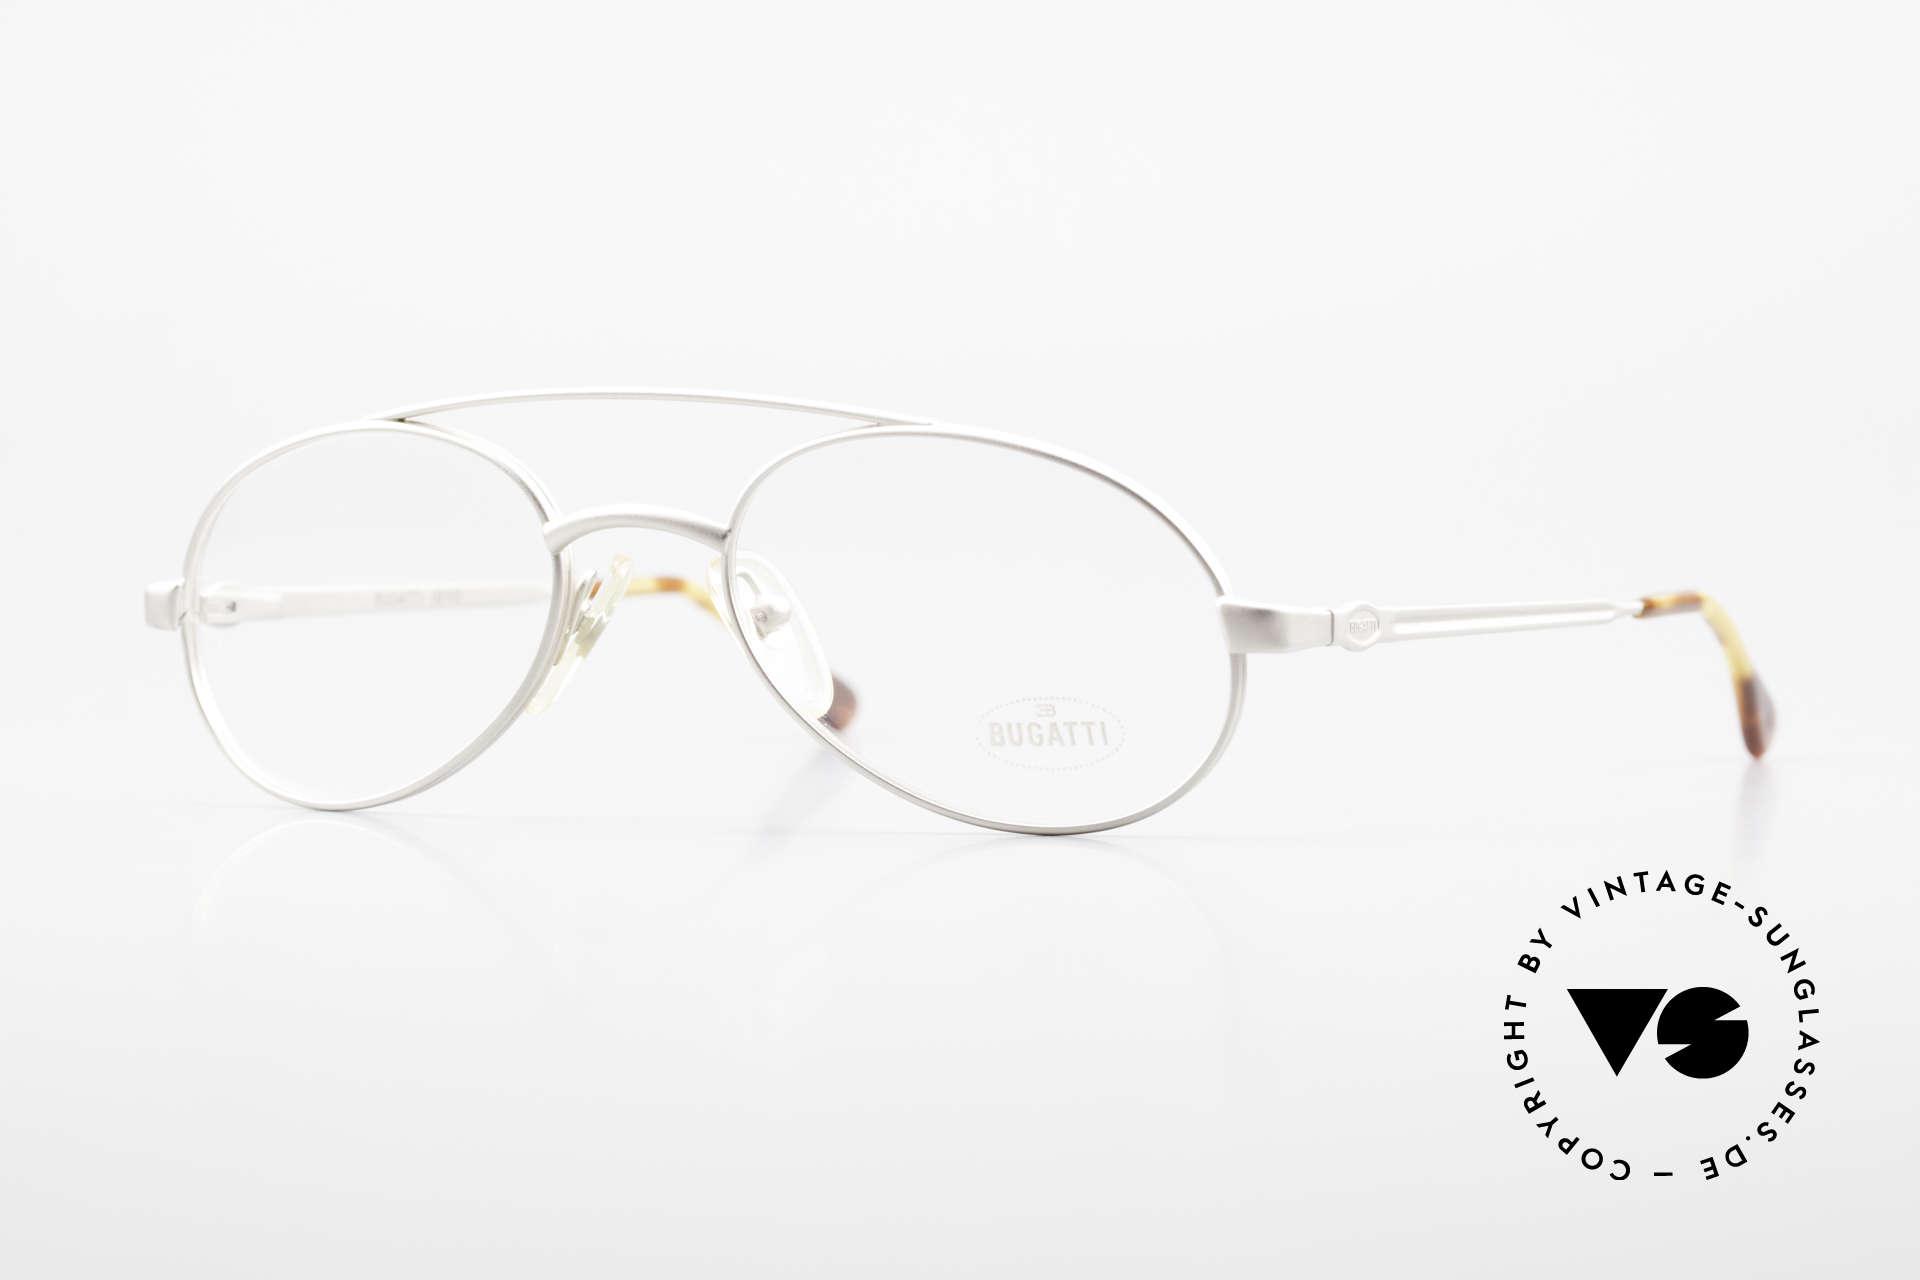 Bugatti 08105 Old Vintage Glasses 80's Men, old Bugatti glasses, dull gray / titanium, 1980's, Made for Men